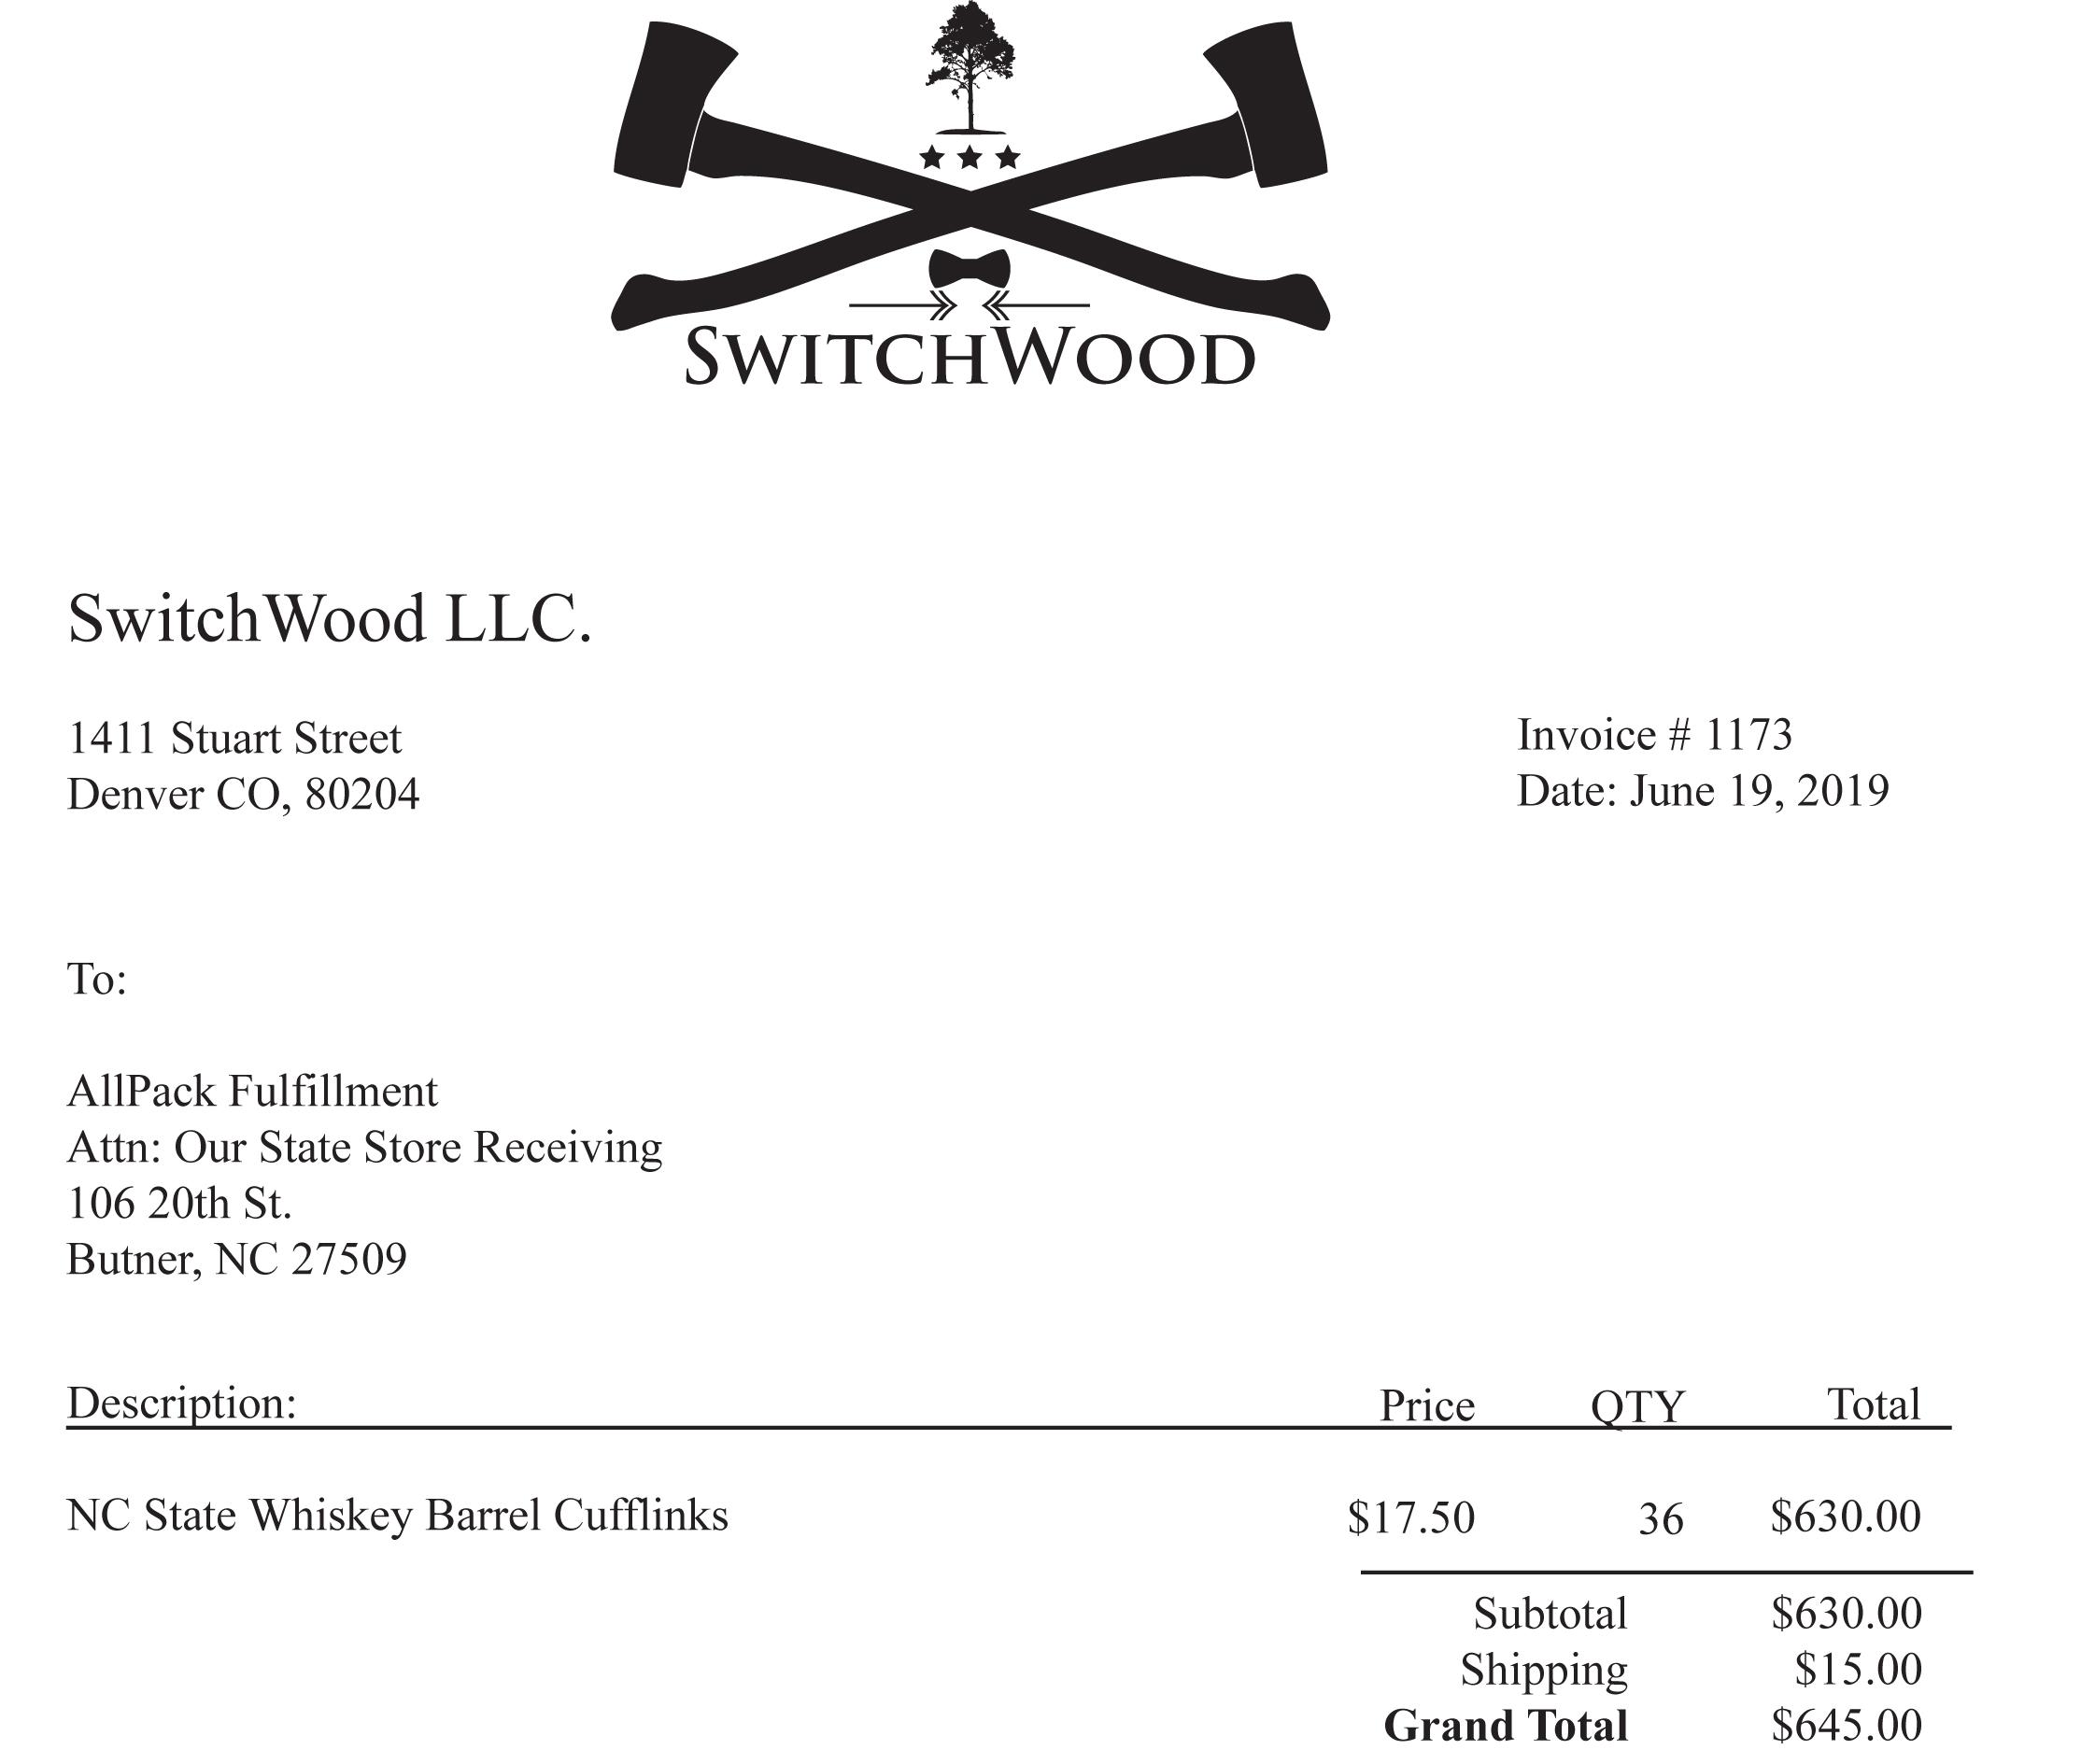 Switchwood Invoice 1173